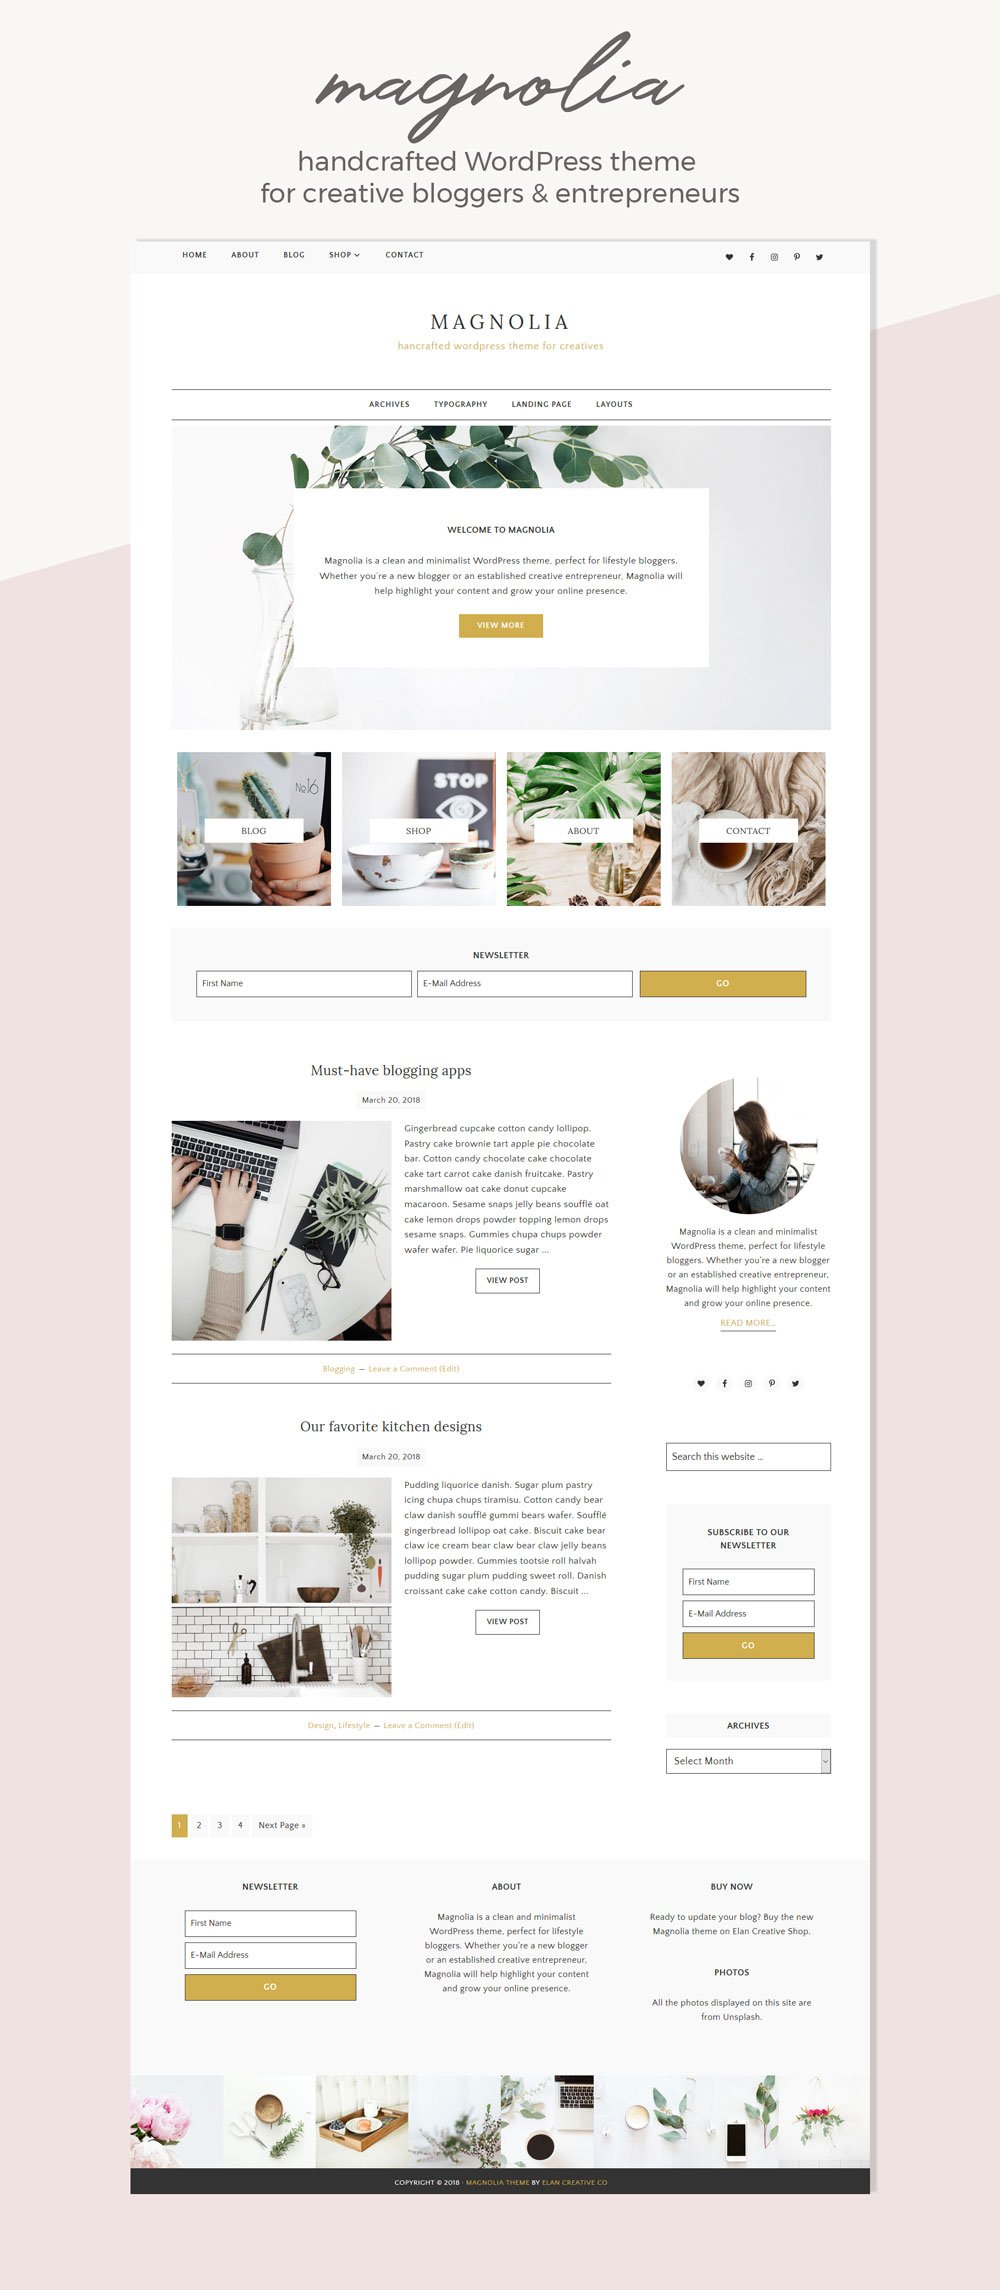 Magnolia Premade WordPress Theme